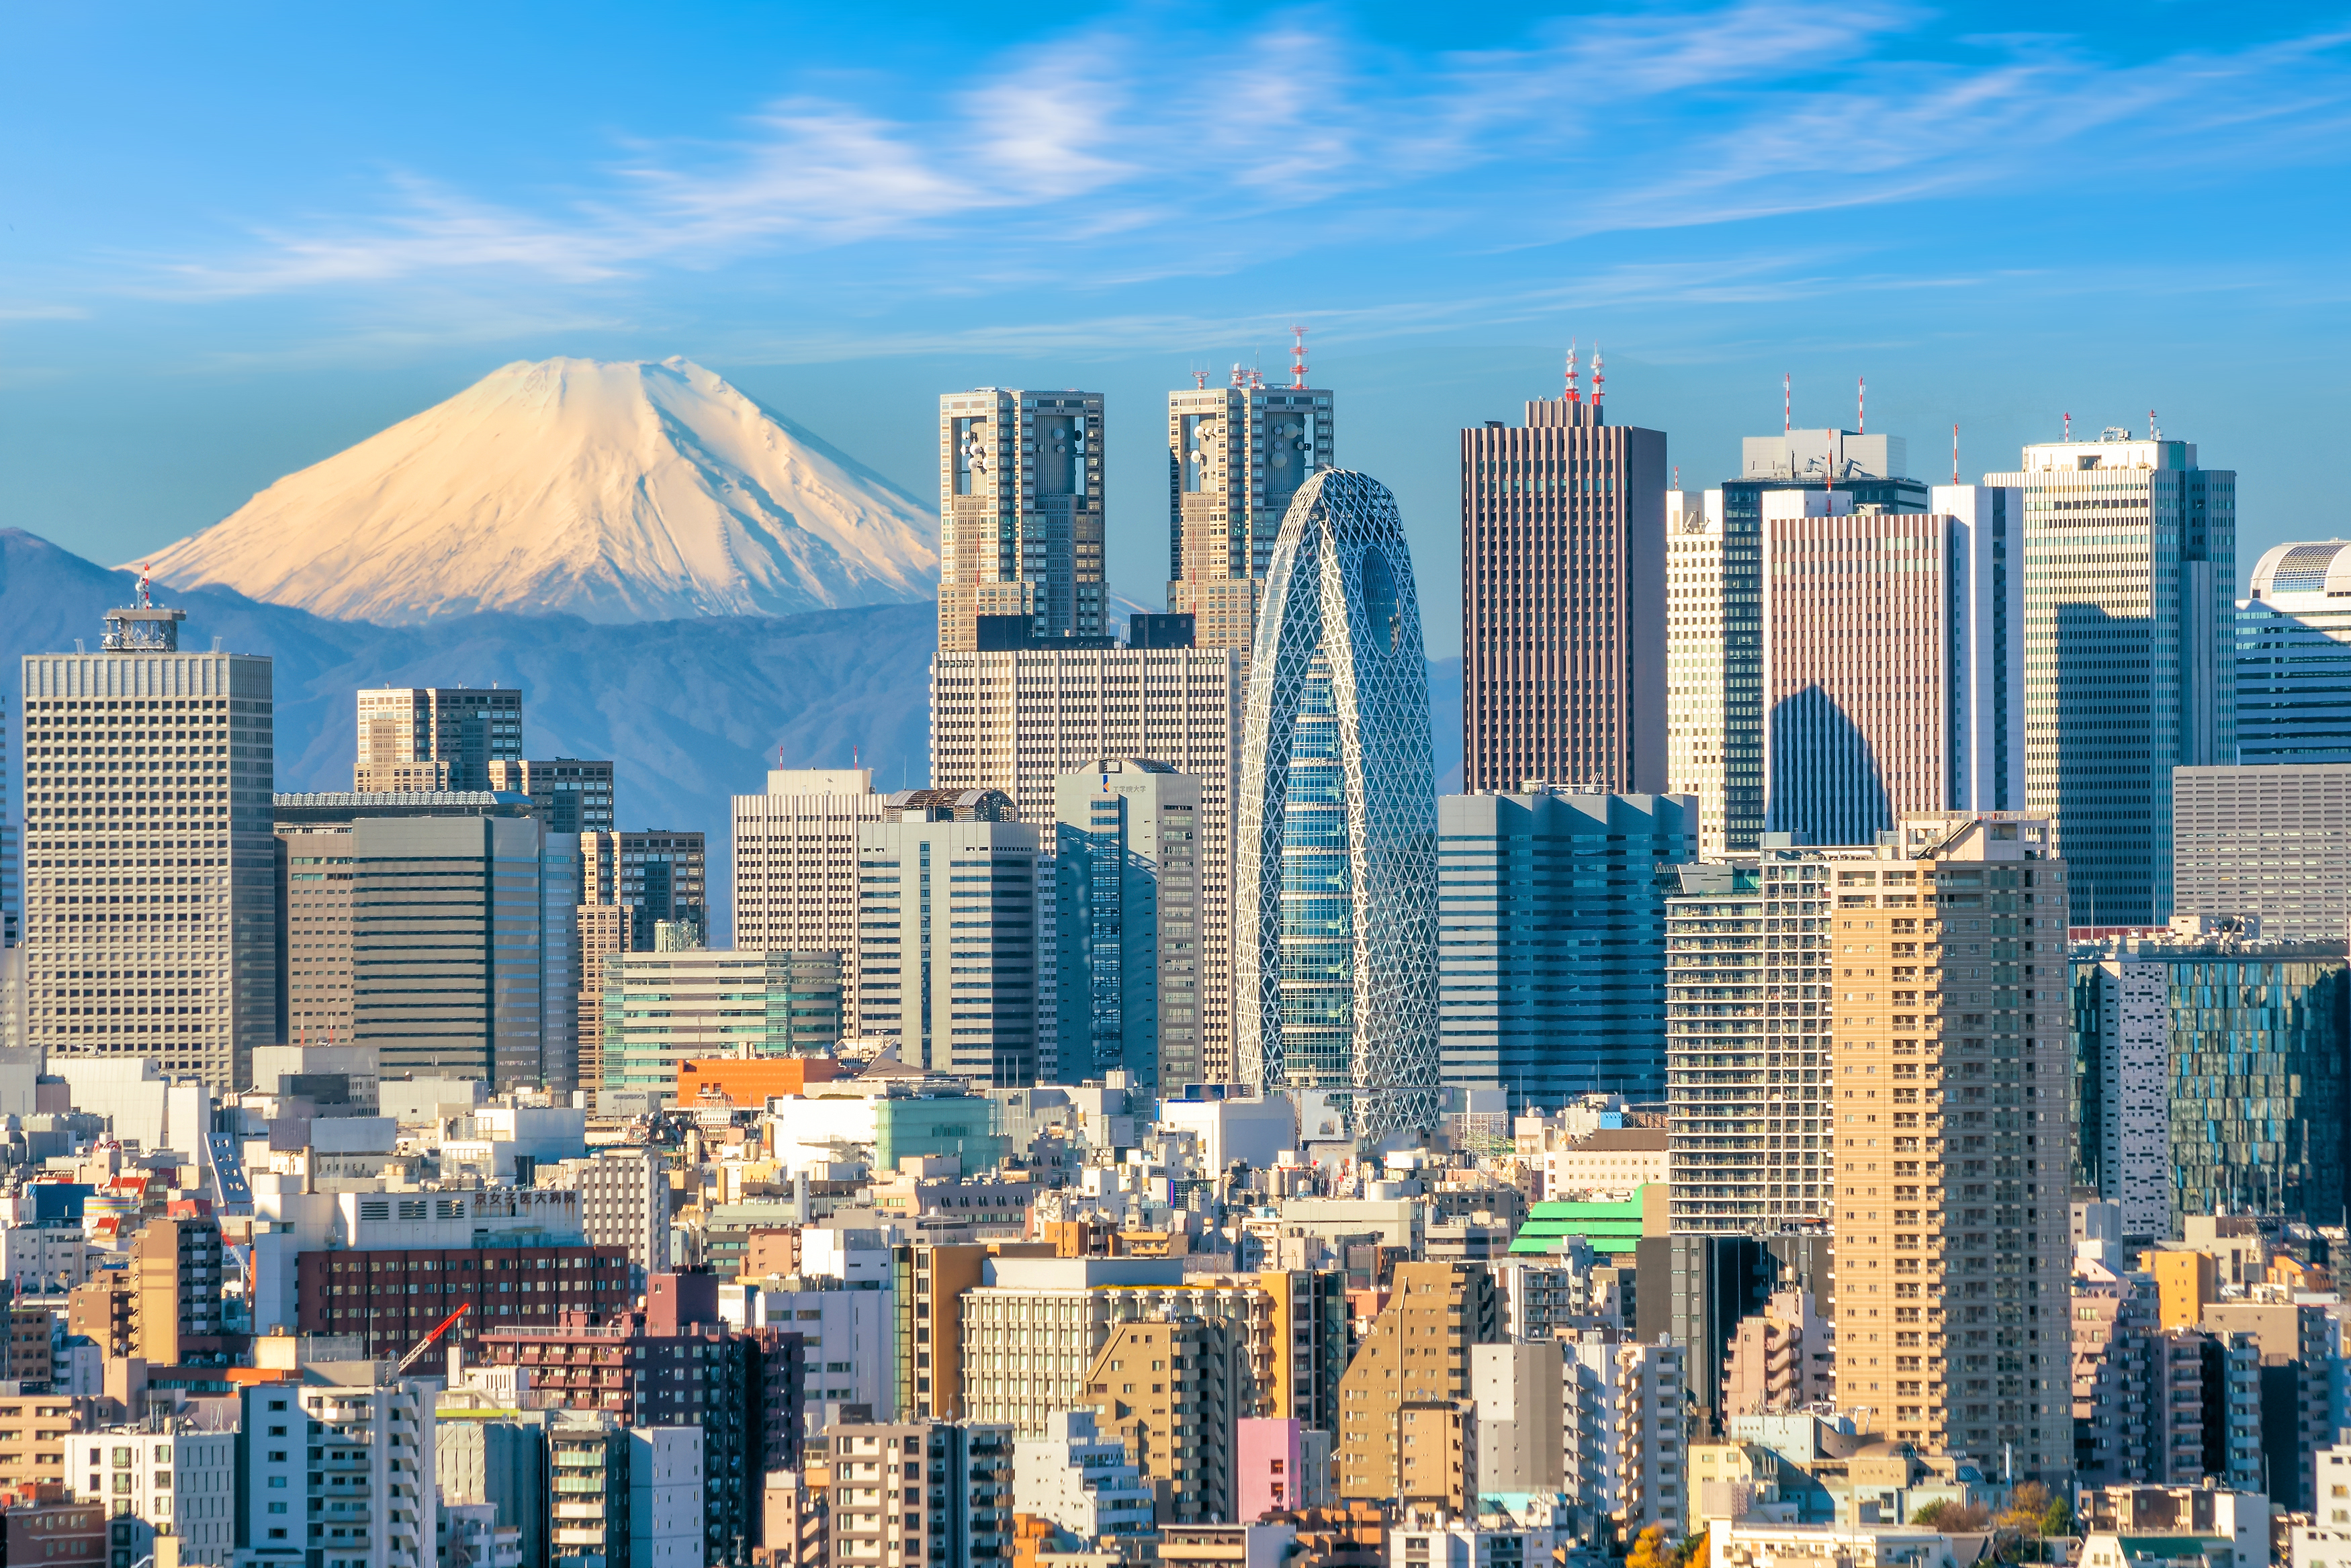 Mount Fuji watches over the Tokyo skyline. SHUTTERSTOCK